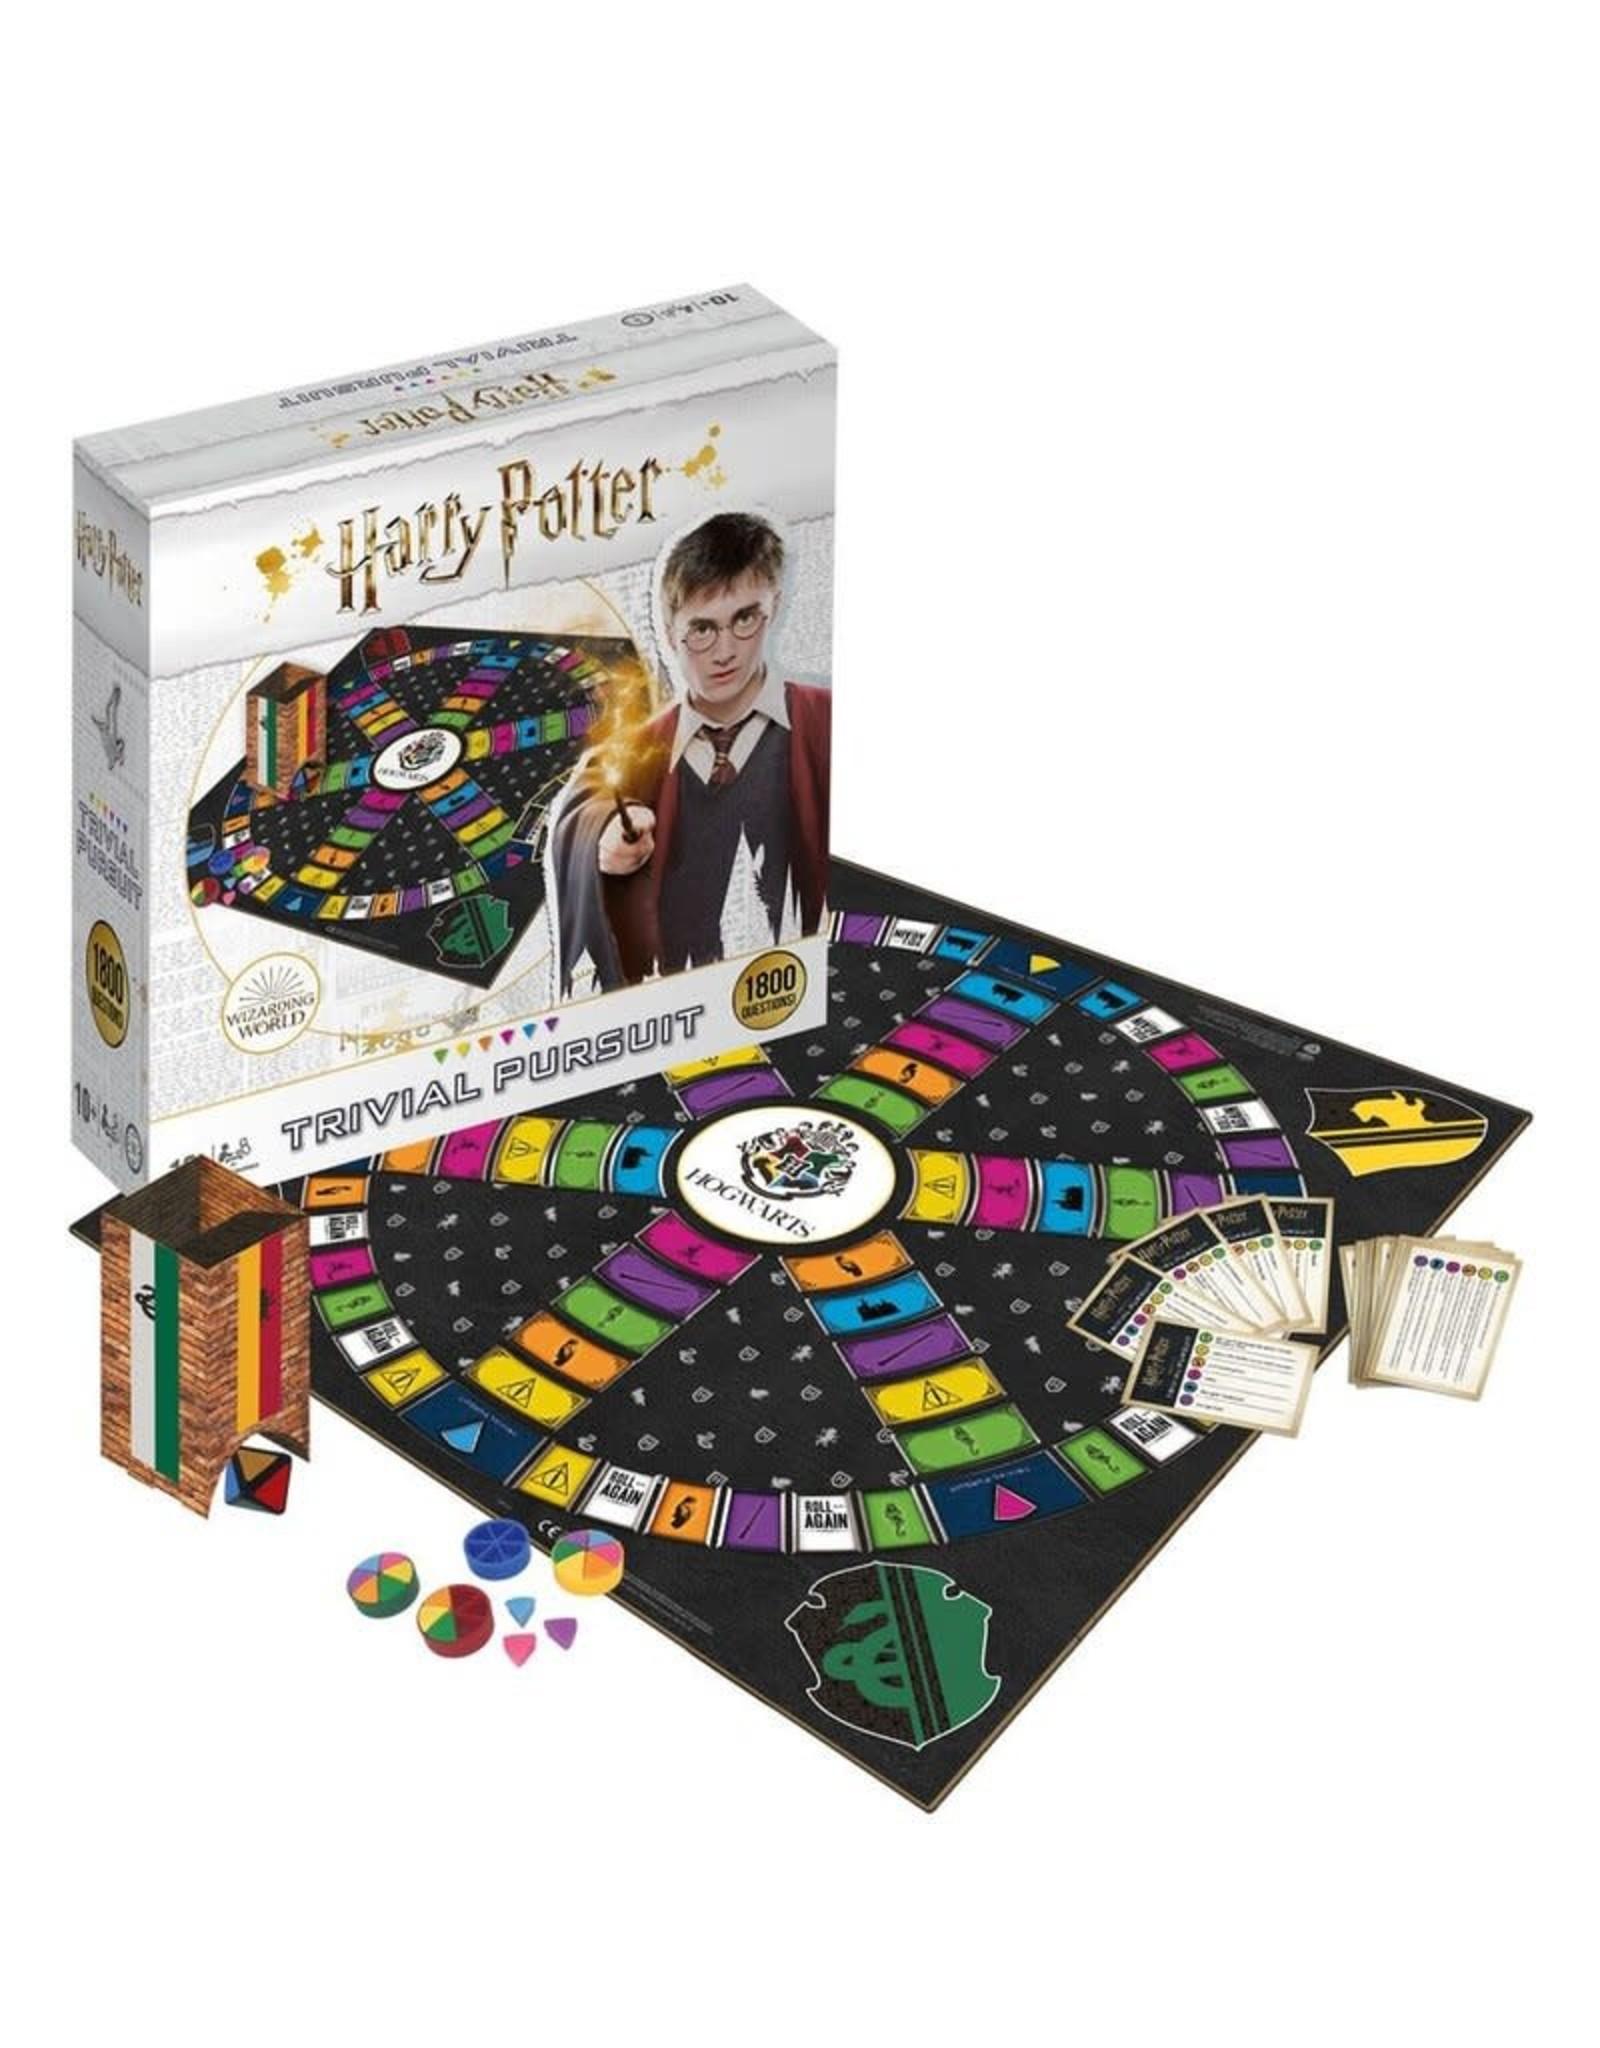 Winning Moves HARRY POTTER Trivial Pursuit ULTIMATE (UK)